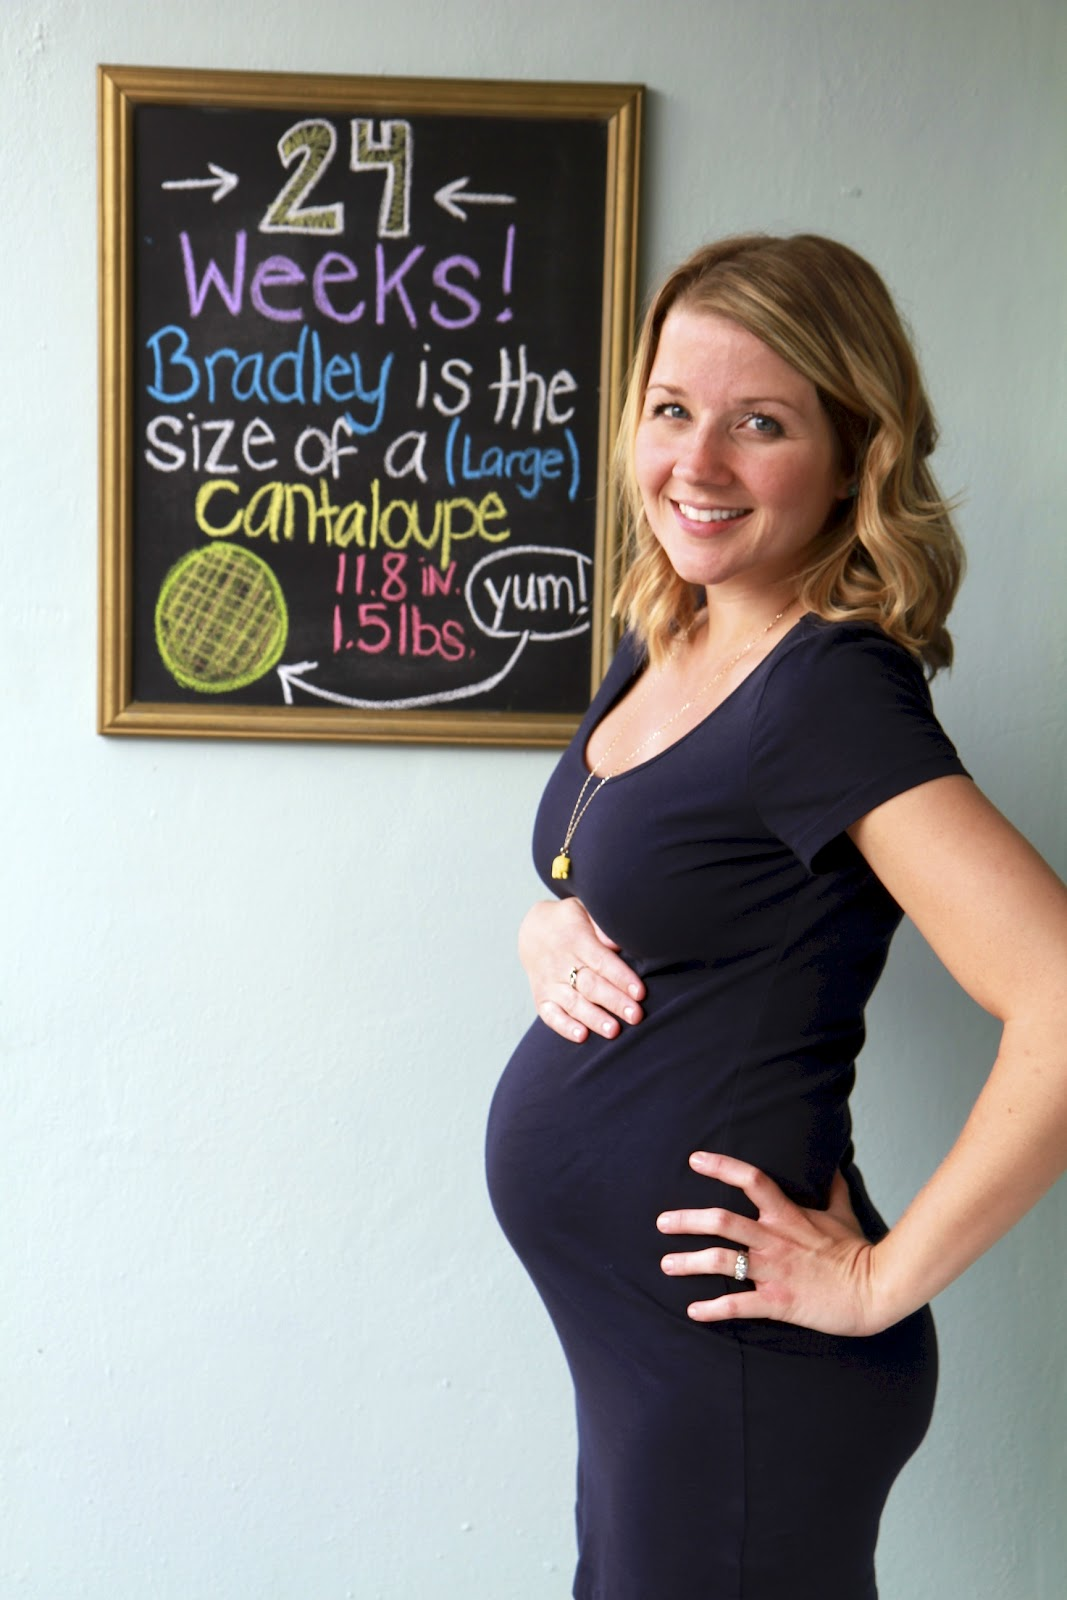 48 Weeks Pregnant Weeks pregnant?: 24 weeks 2 days. total weight gain ...